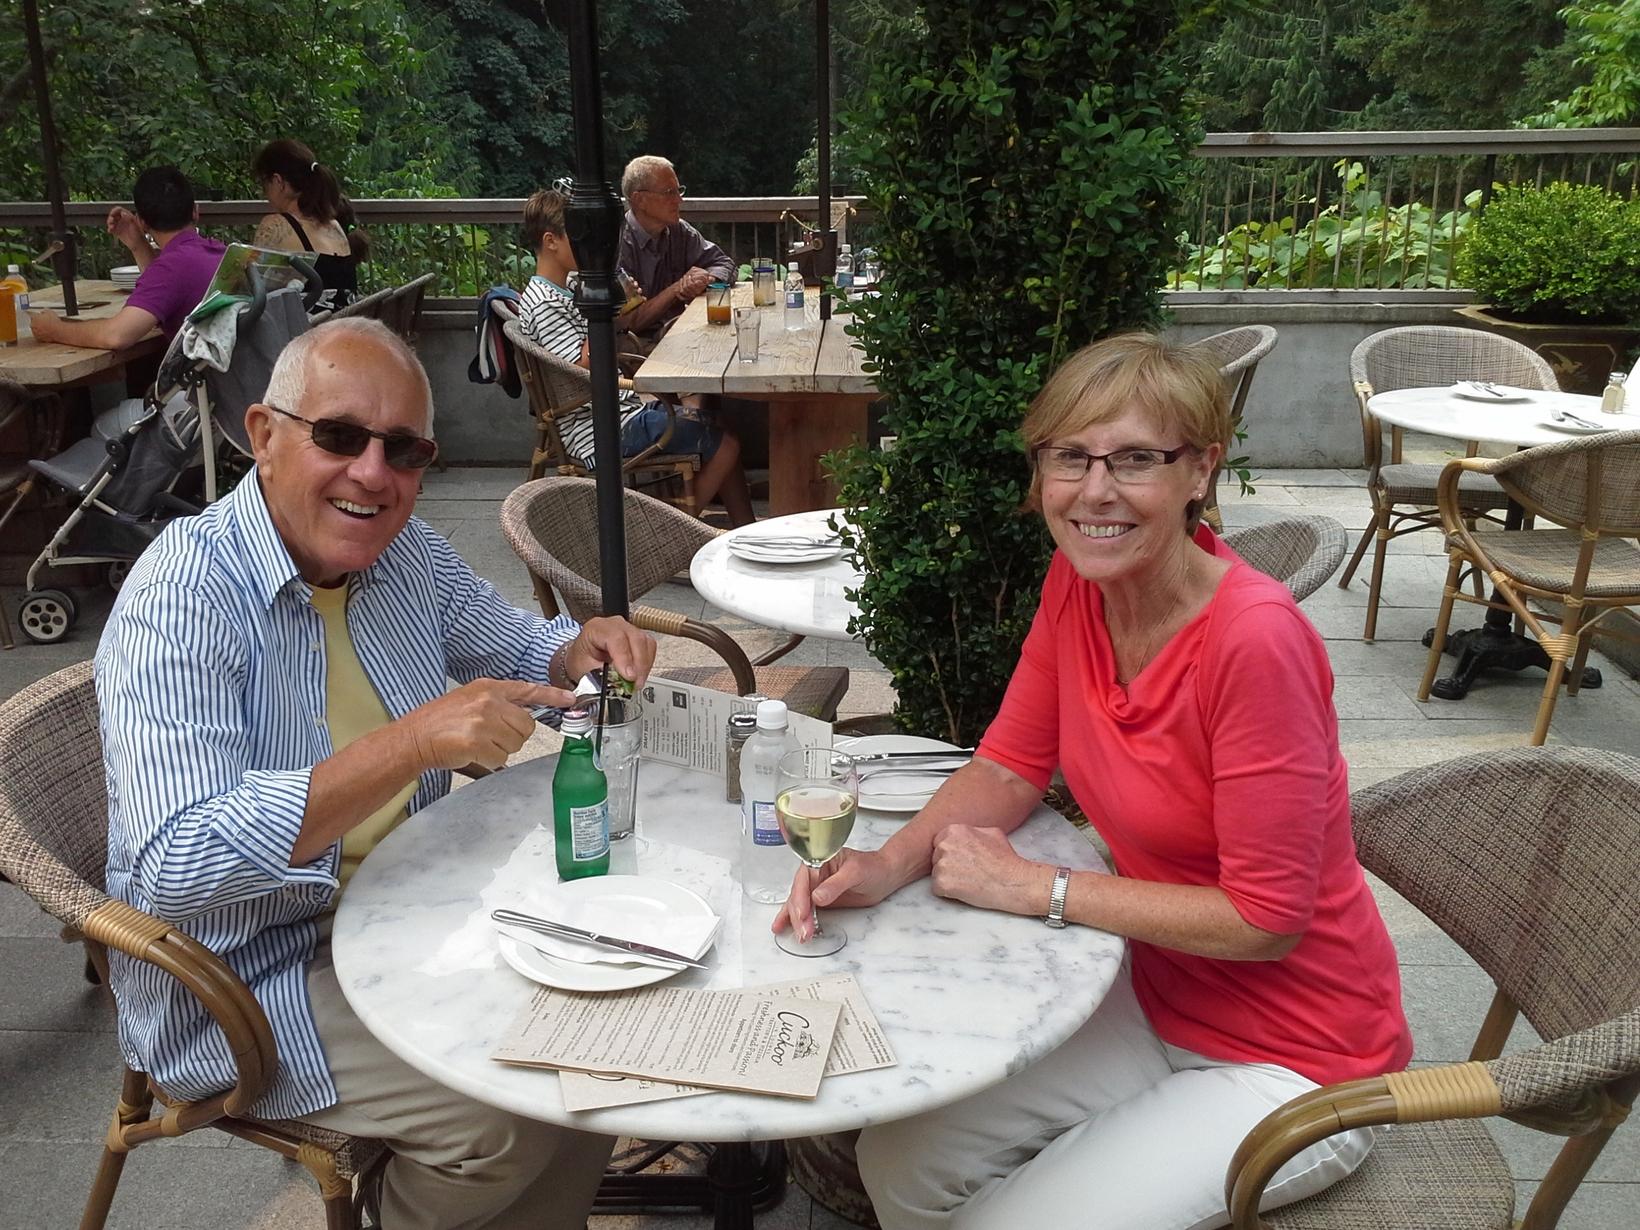 Wendy & Robert from Victoria, British Columbia, Canada